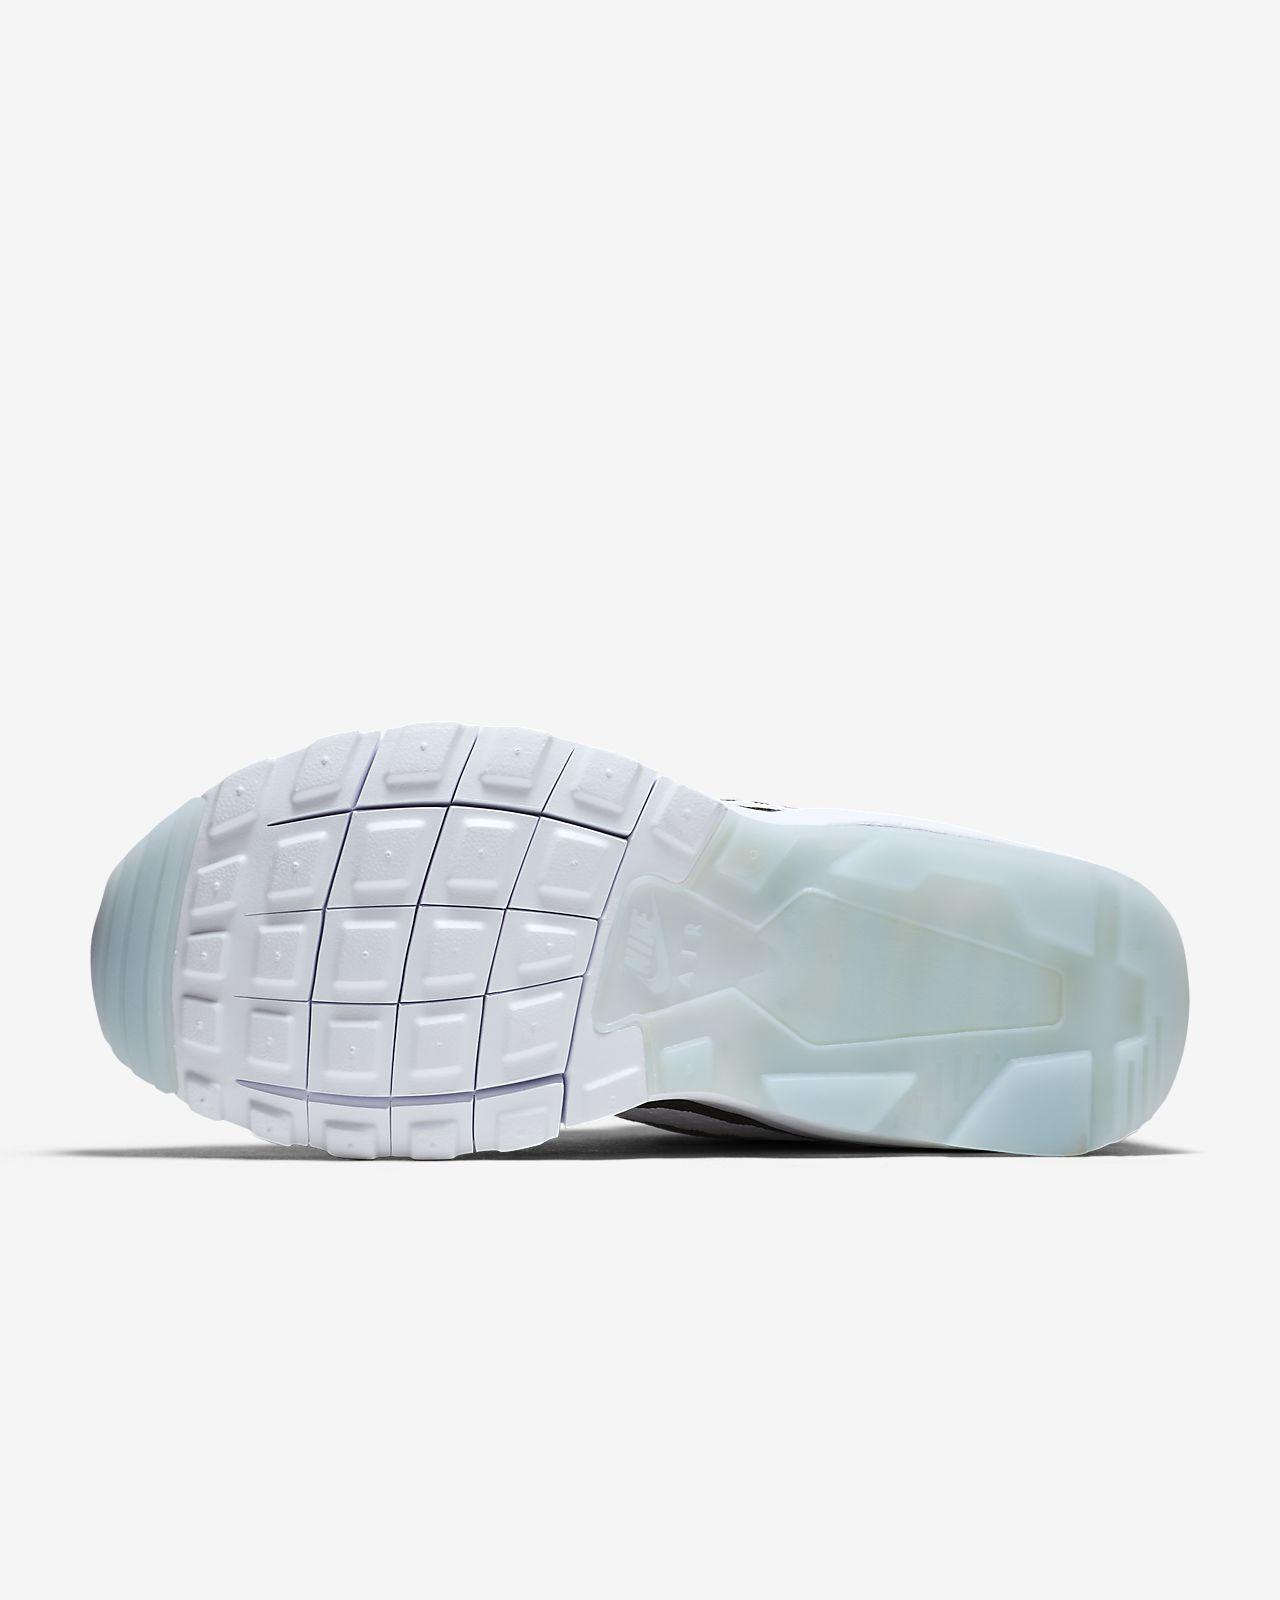 Details zu Nike Air Max Motion Schuhe Gr. 37 41 Sportschuhe